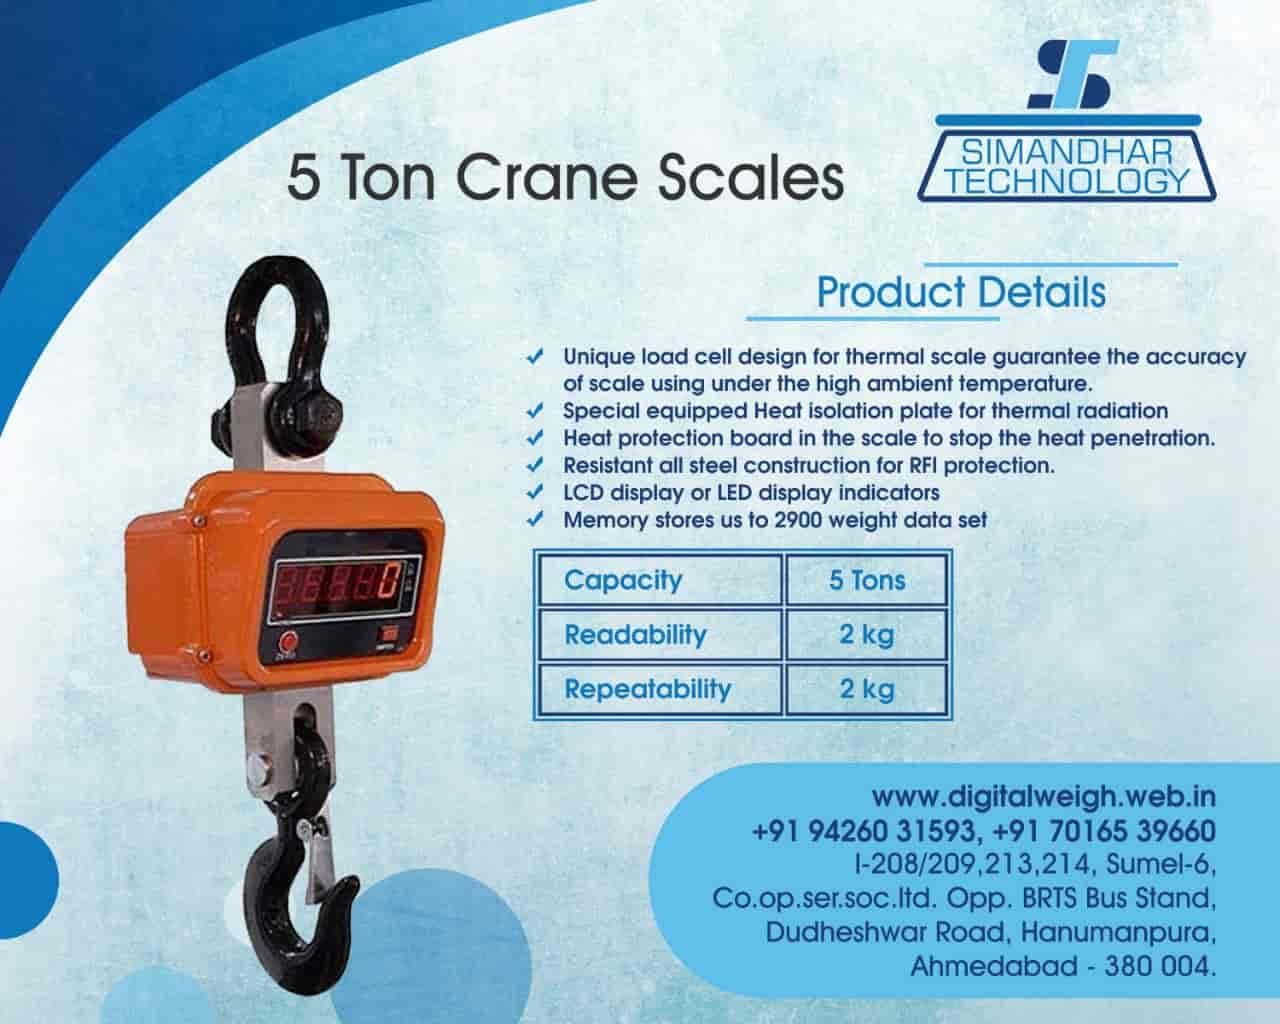 Simandhar Technology, Dariapur - Weighing Machine Dealers in